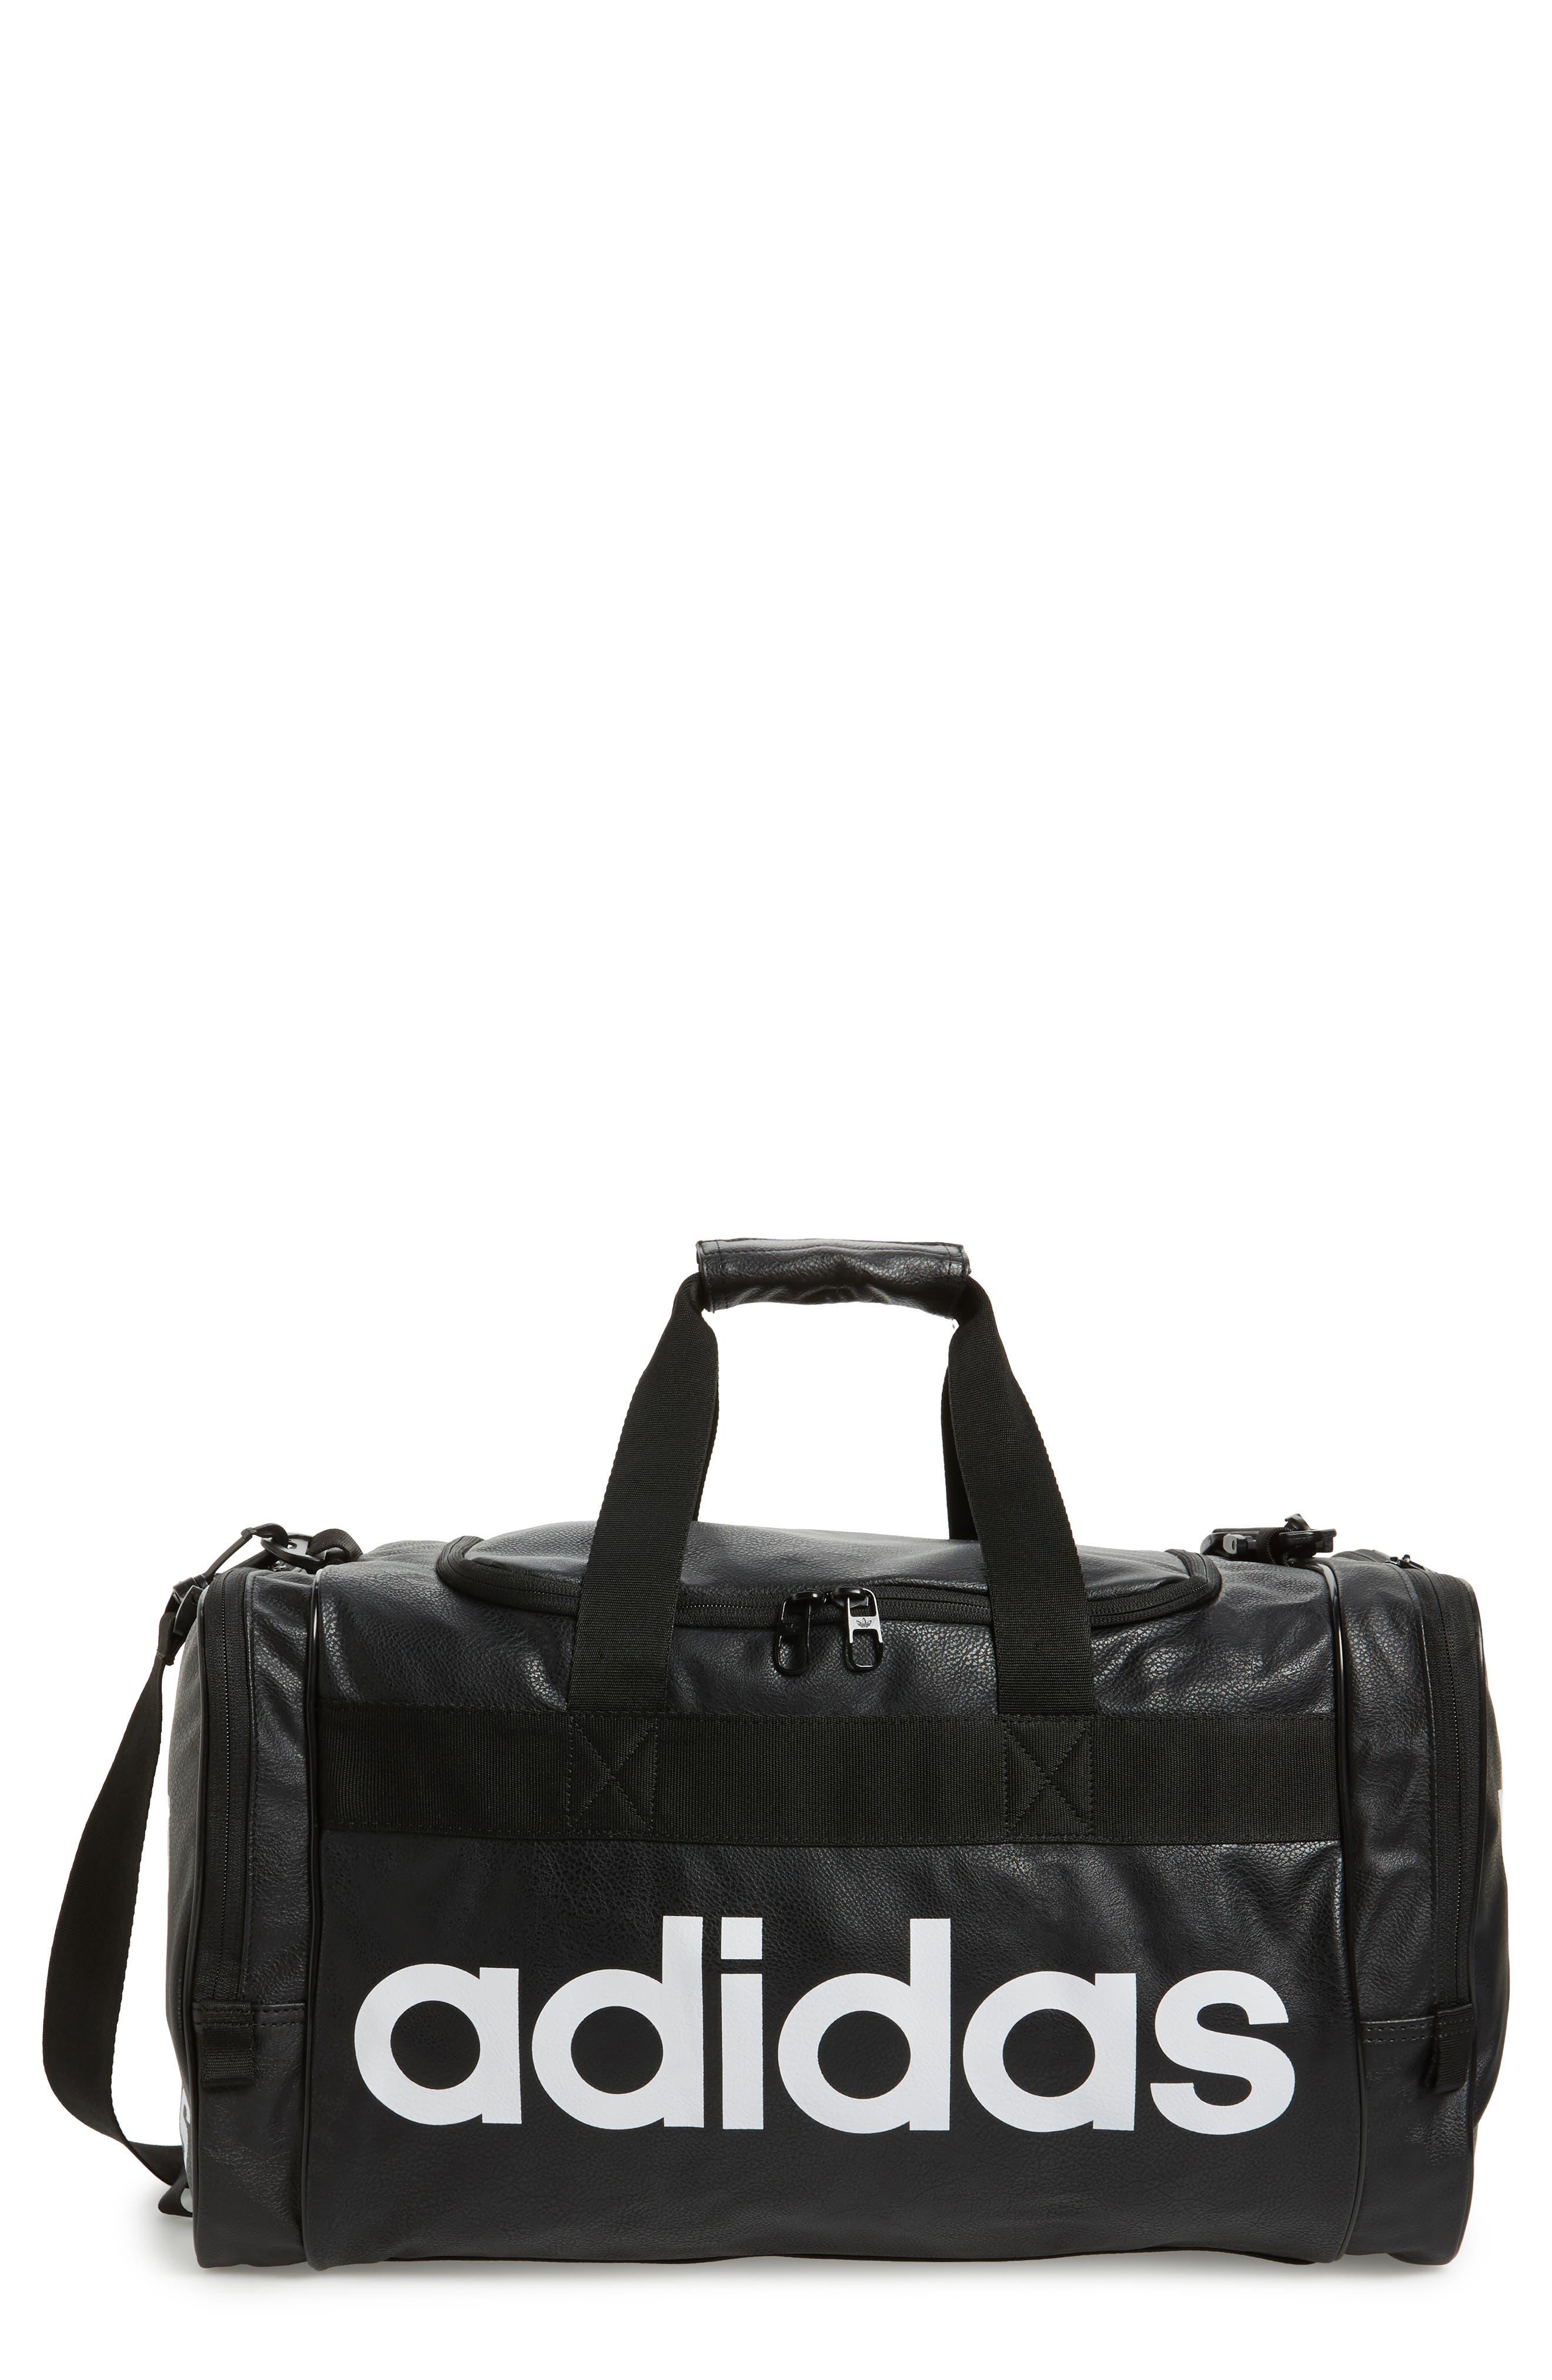 ADIDAS ORIGINALS Santiago Duffle Bag, Main, color, BLACK/ CHALK WHITE